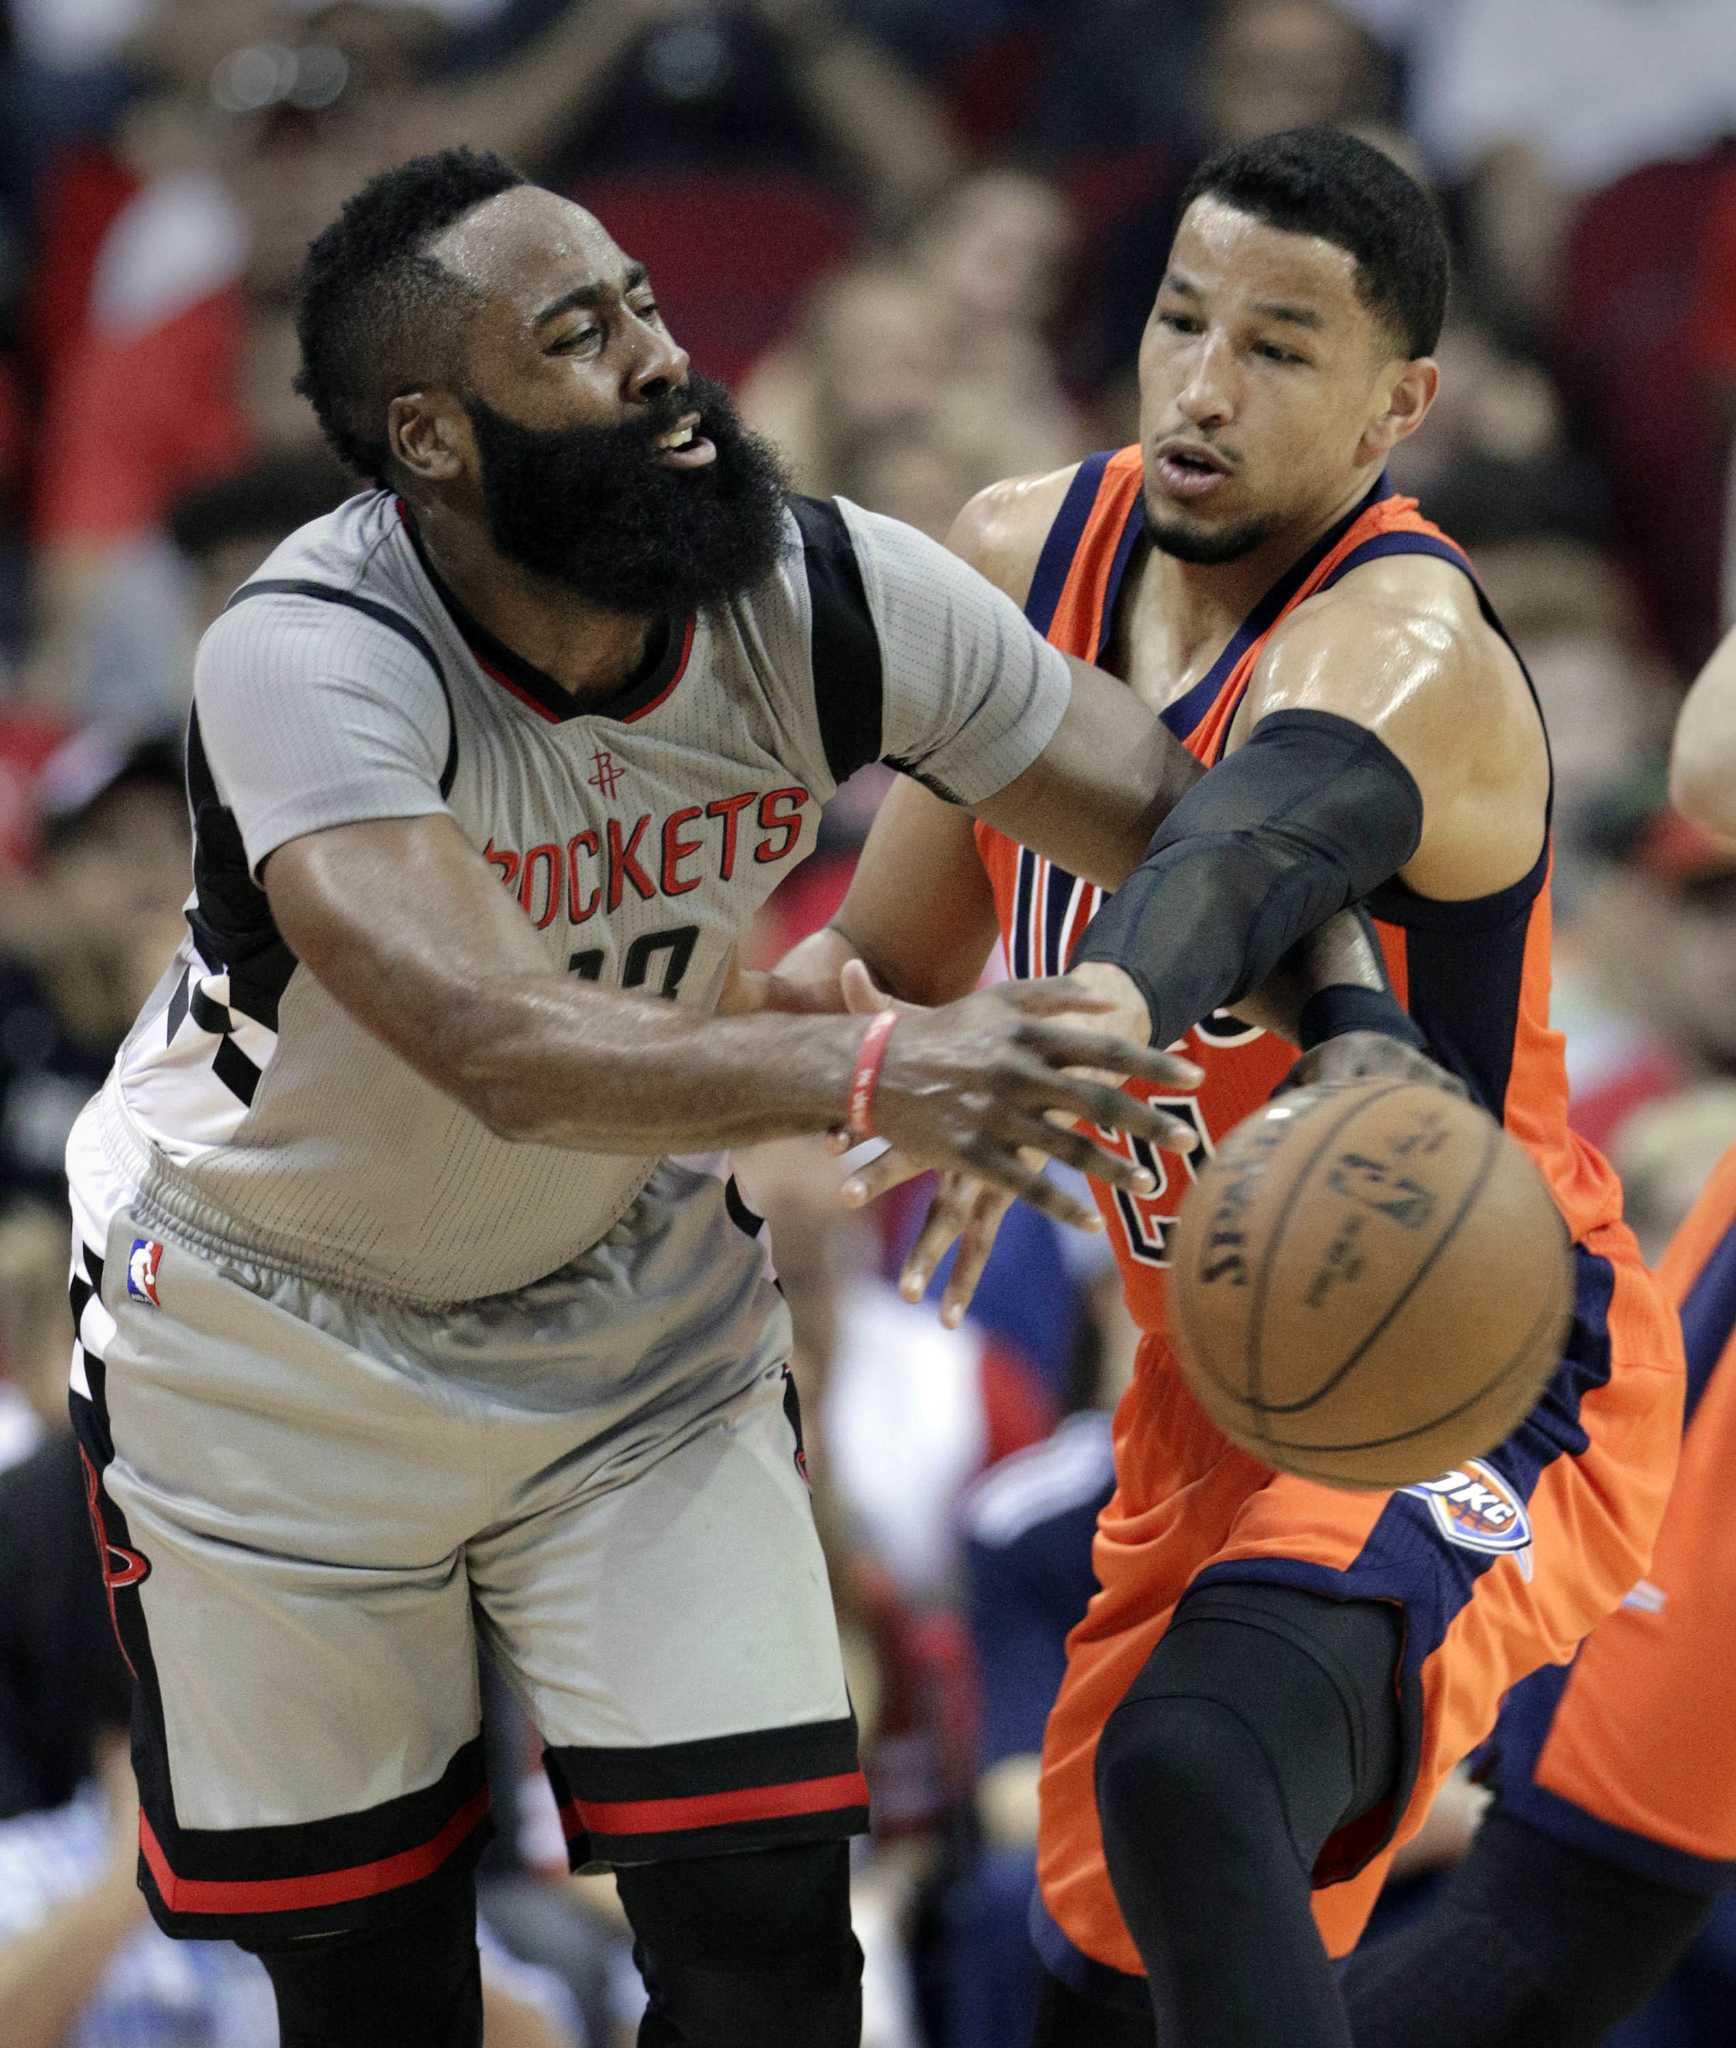 James Harden Nba Records: Rockets' James Harden Expects To Play Vs. Warriors Despite